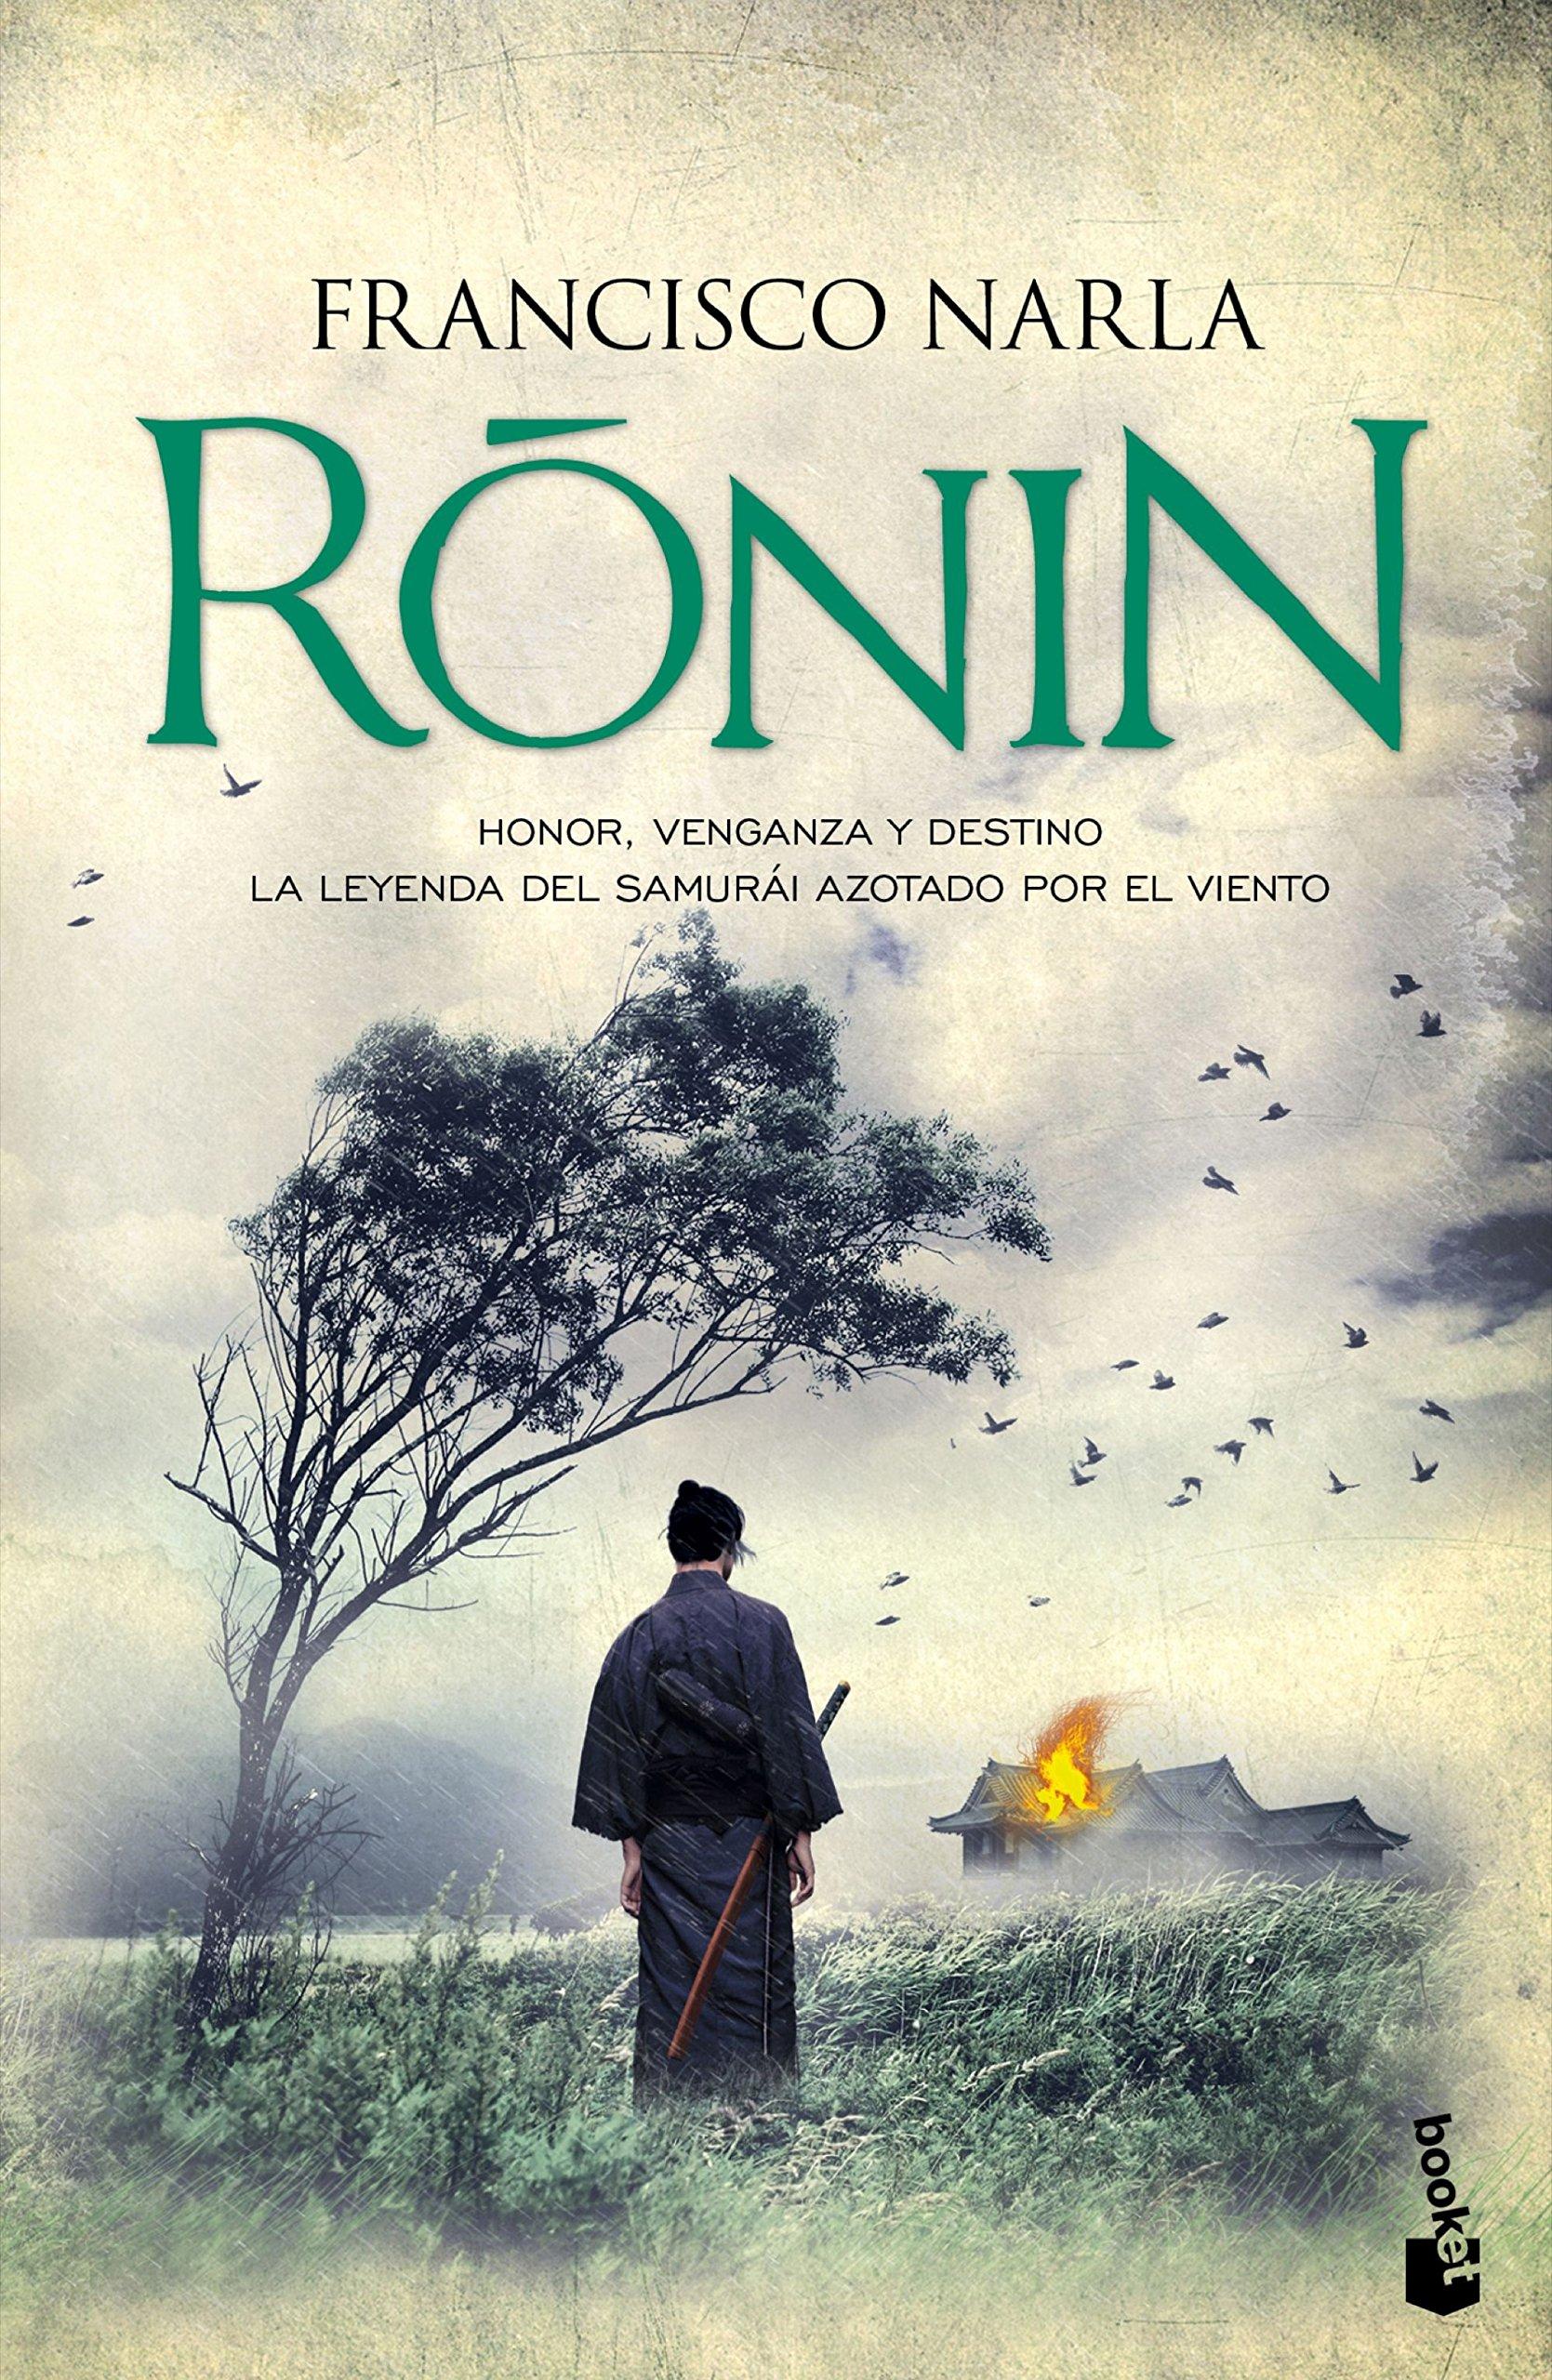 Ronin (Bestseller): Amazon.es: Narla, Francisco: Libros